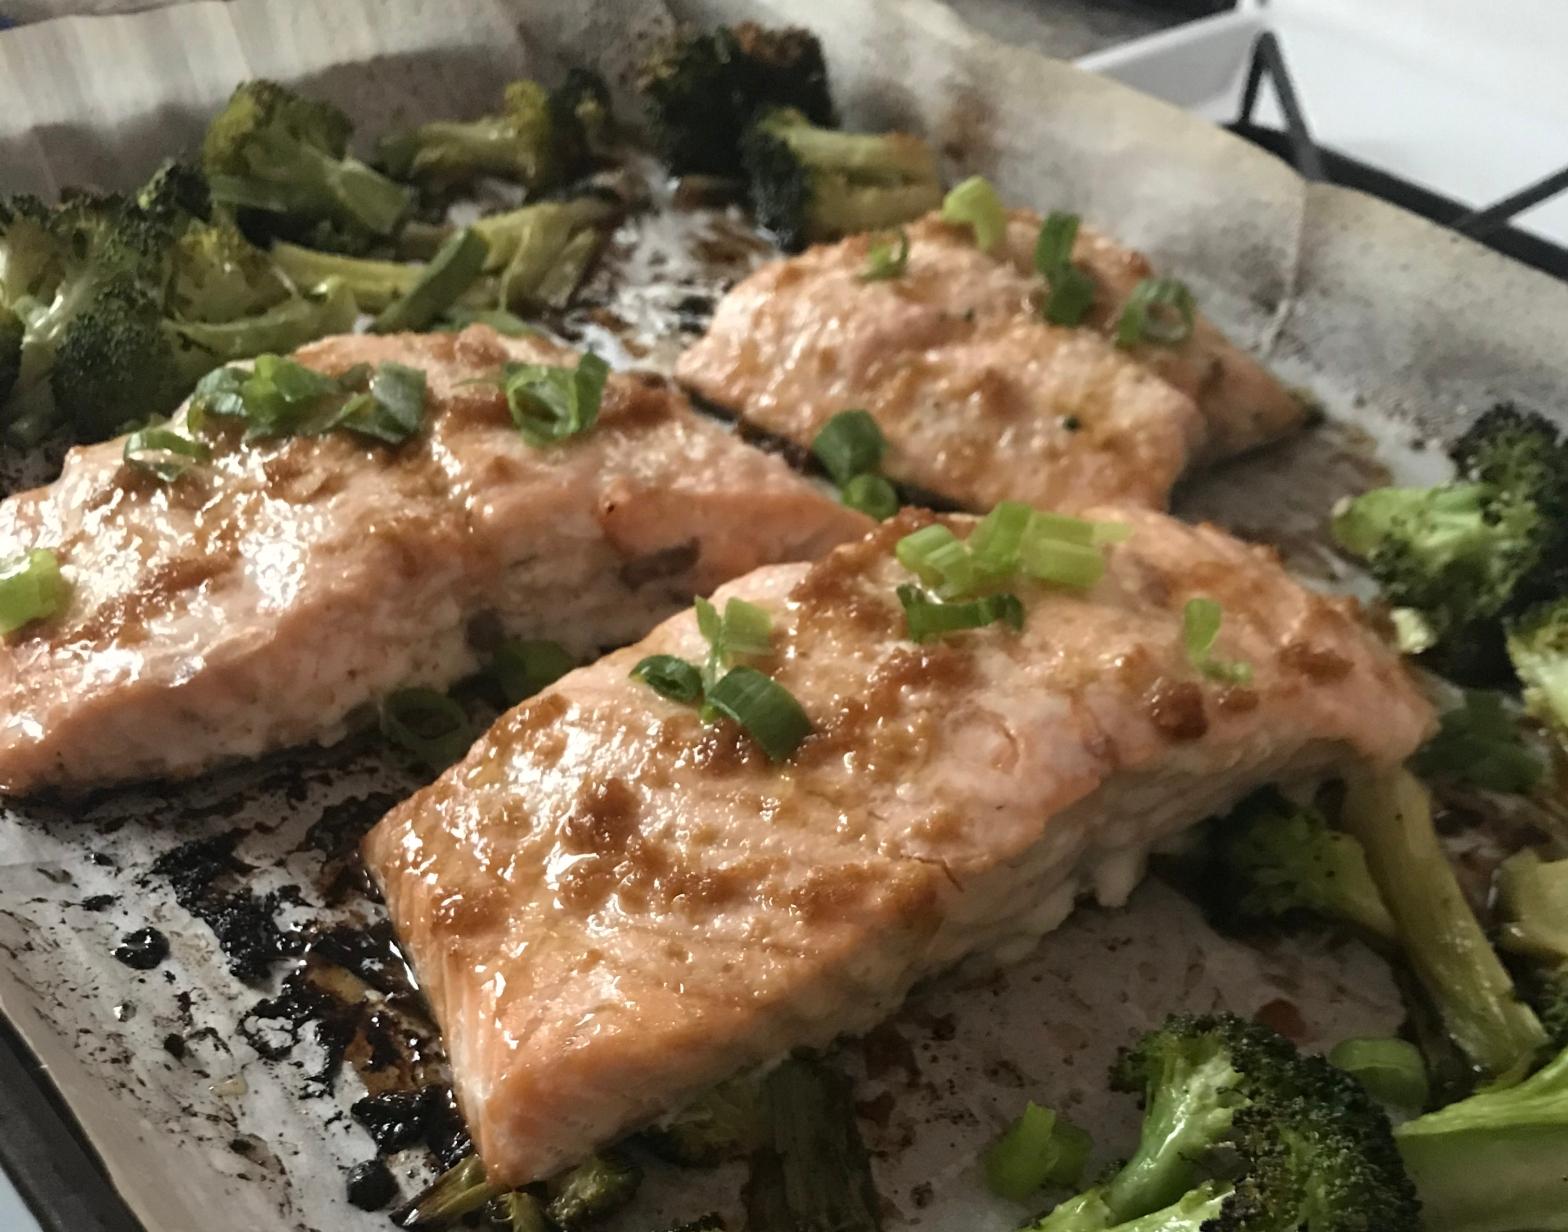 Sheet-pan sesame and ginger salmon